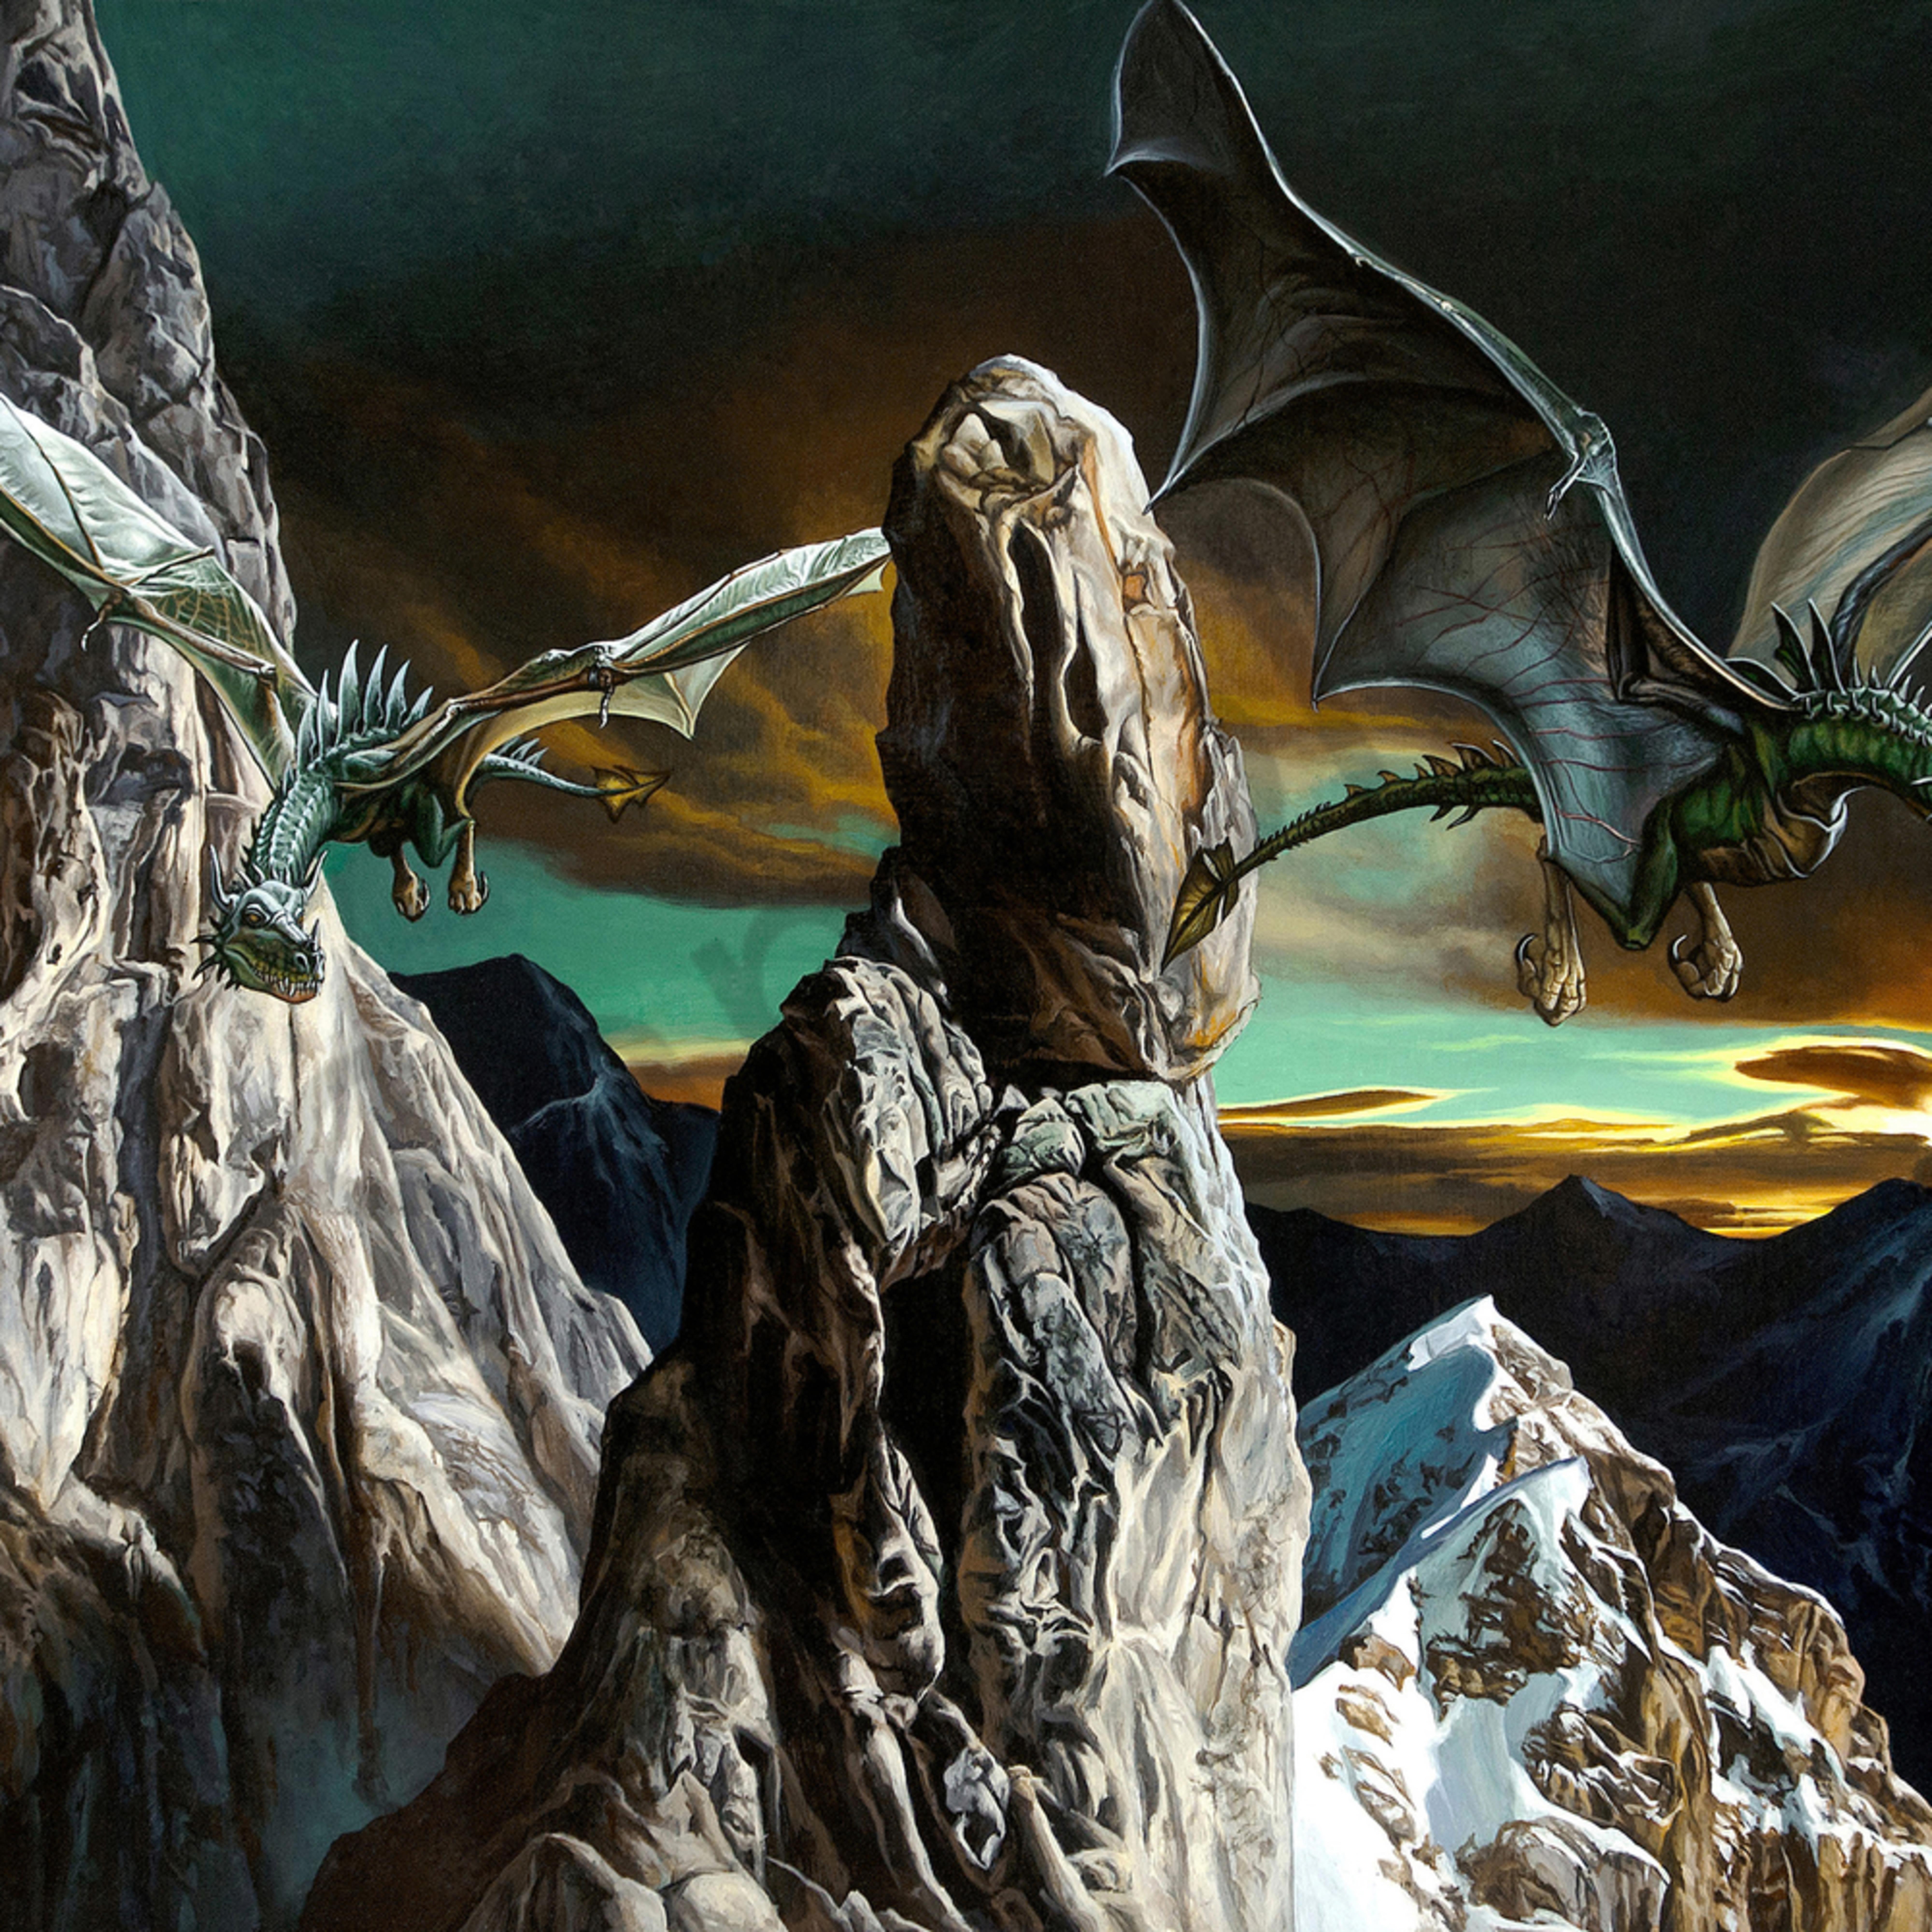 Dragons in flight print file umoqjm